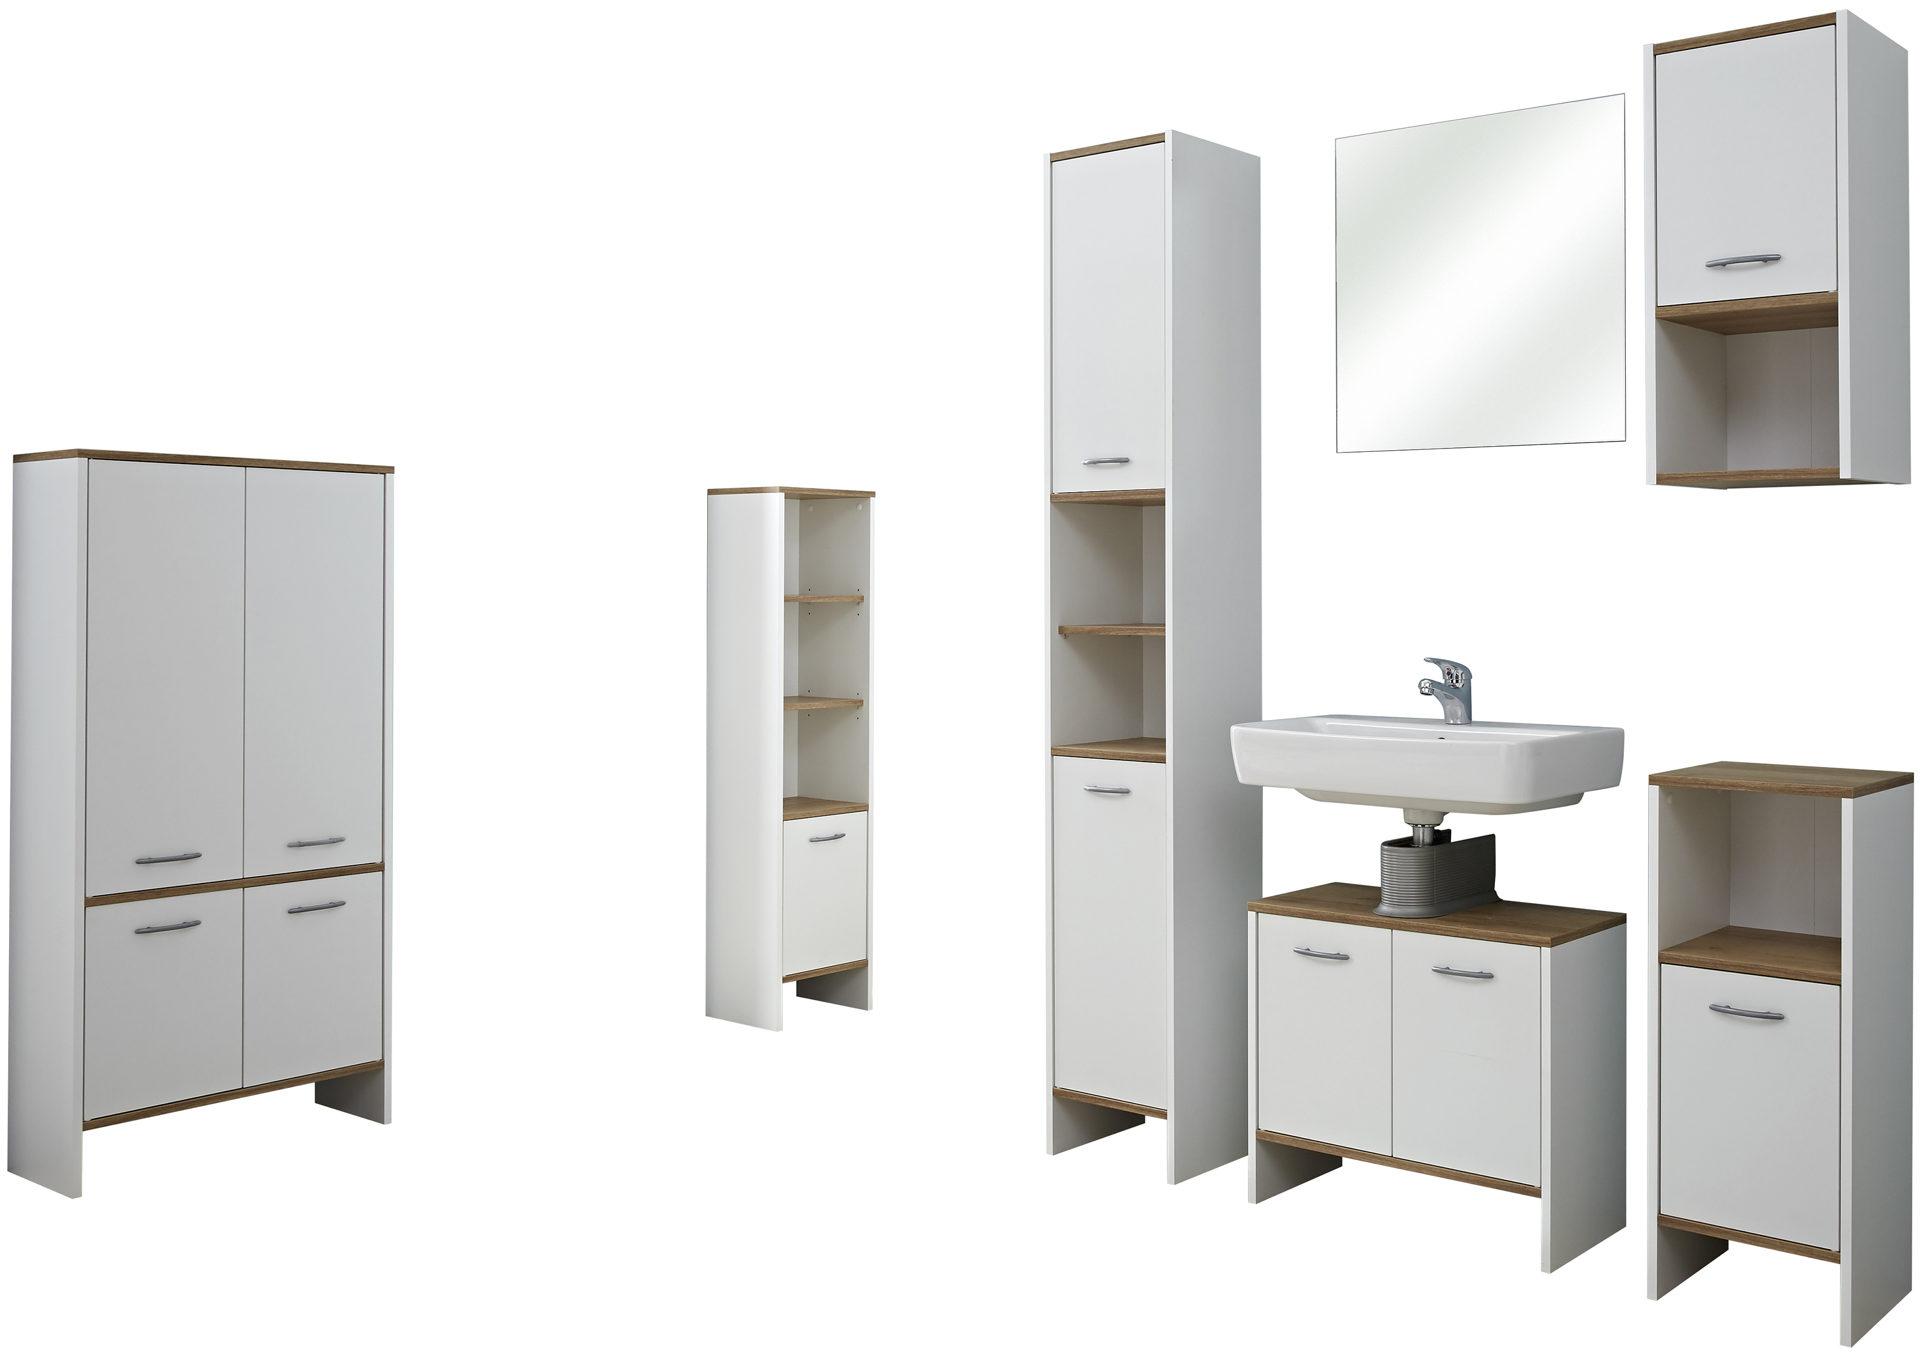 Badezimmer Hochschrank Pelipal Cassca Solitaire Badmobel Marken